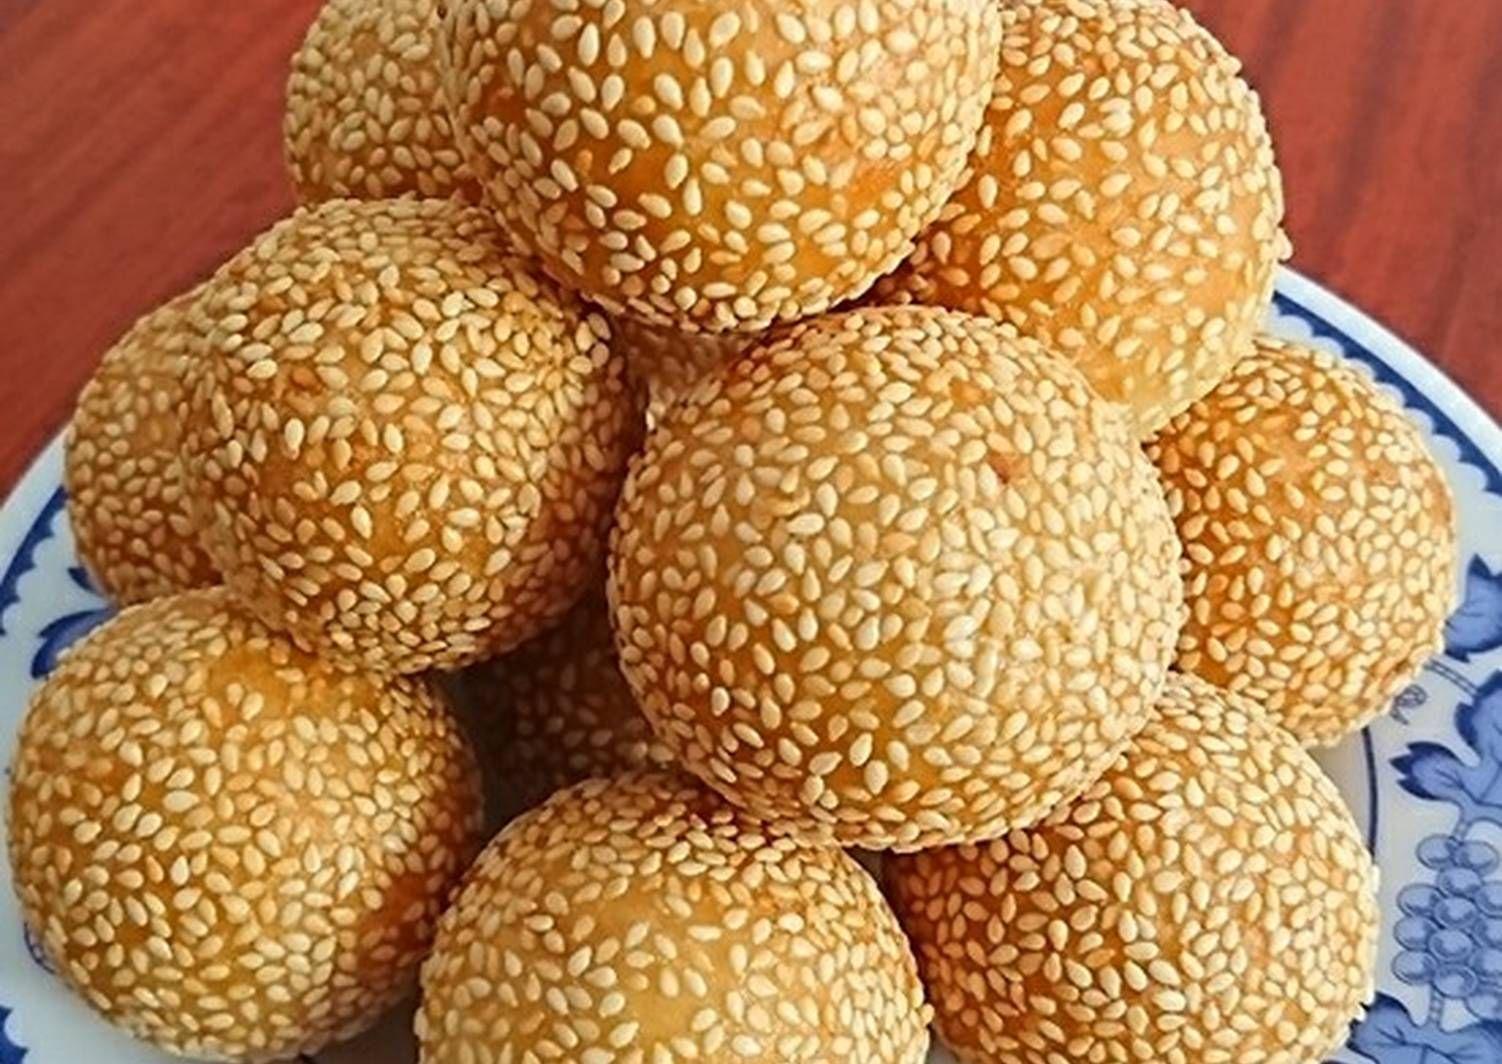 Resep Onde Onde Isi Kacang Hijau Oleh Cahyaning Ati Resep Kacang Resep Hijau